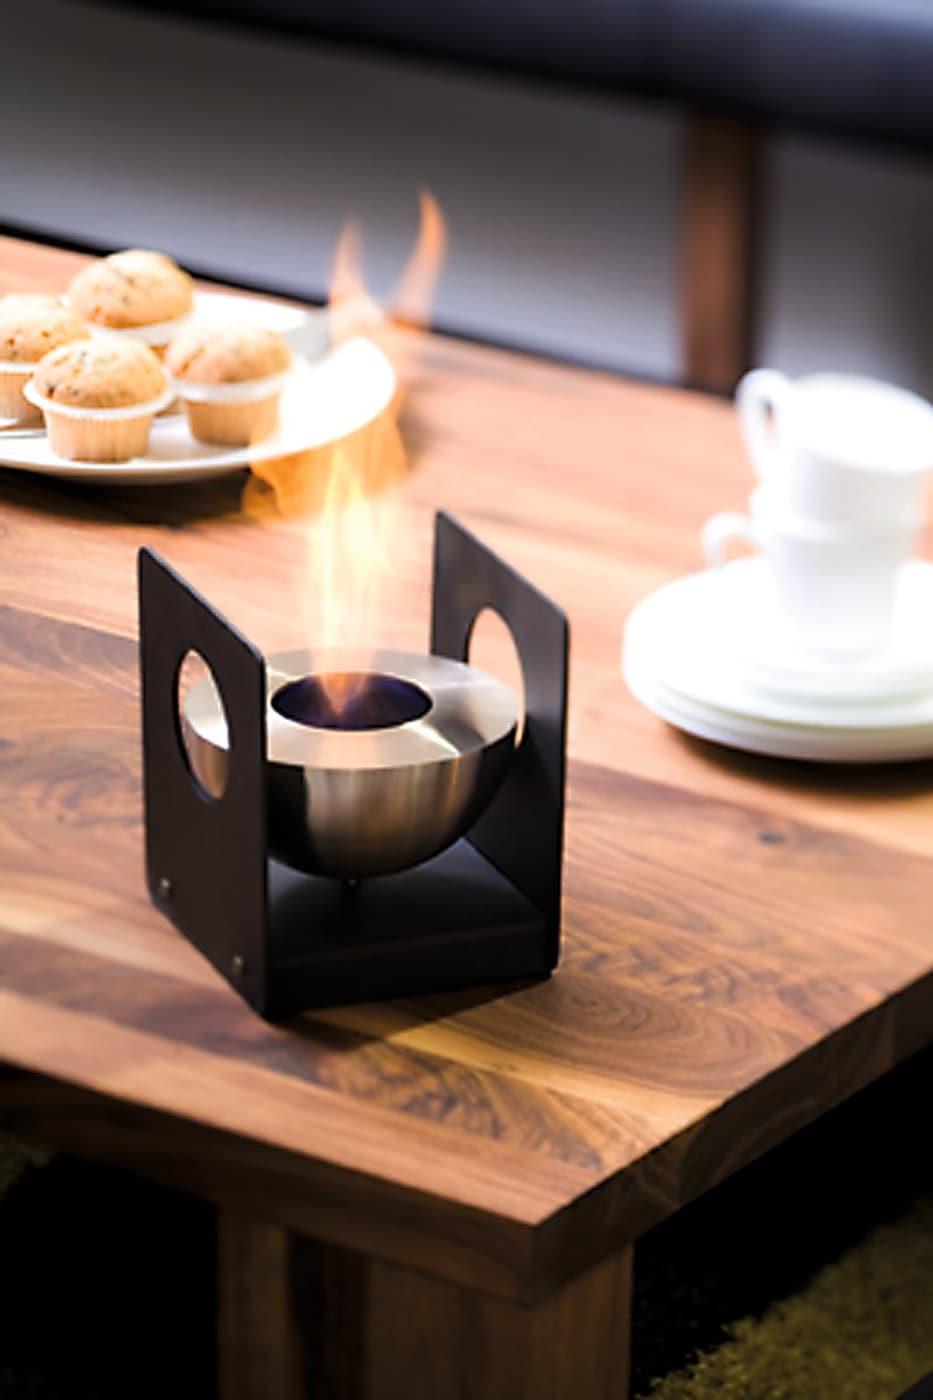 ethanol feuerstelle tobago migros. Black Bedroom Furniture Sets. Home Design Ideas